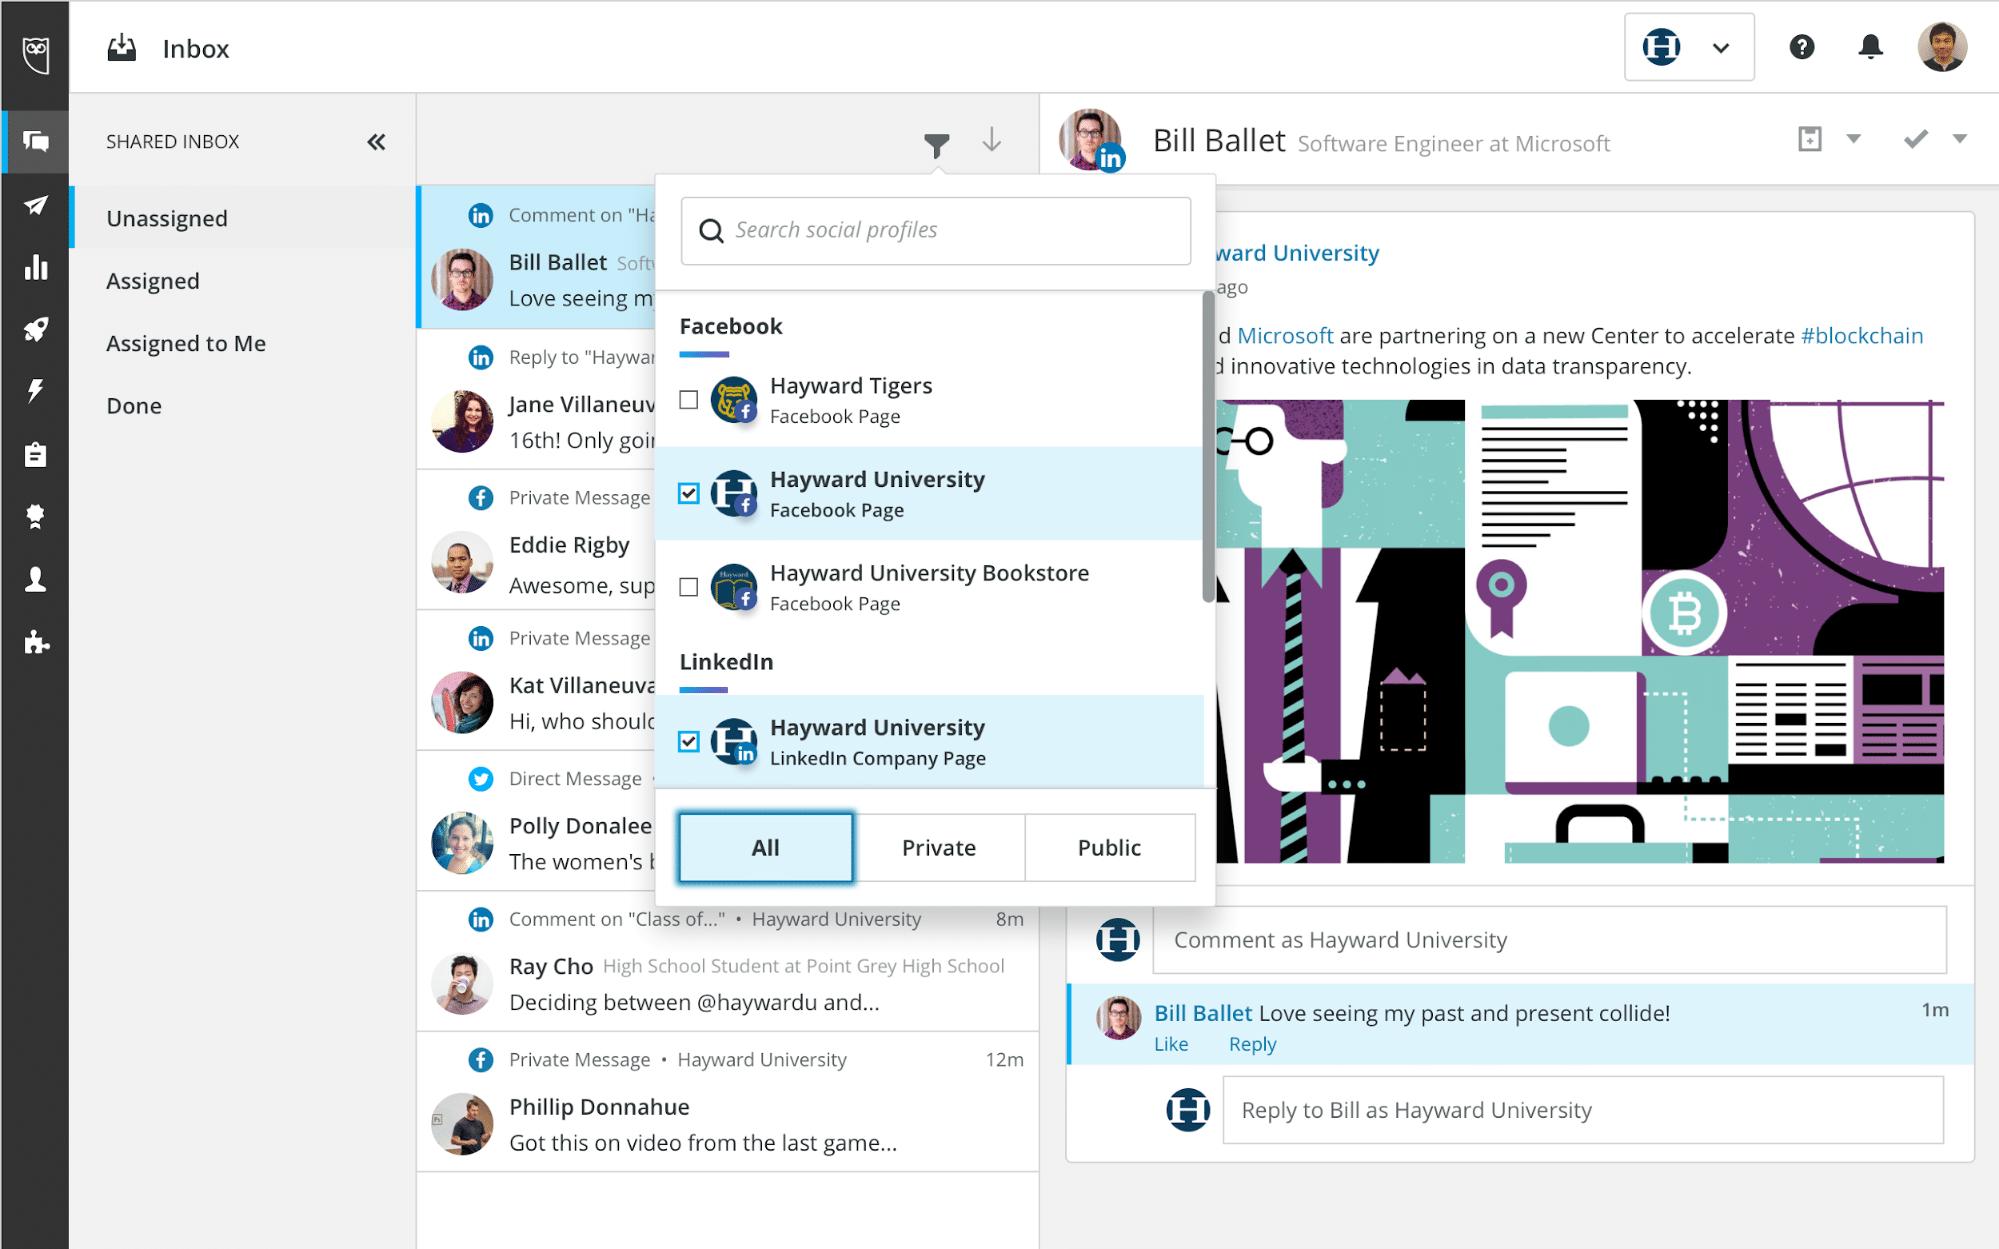 Hootsuite Inbox customer service inquiries